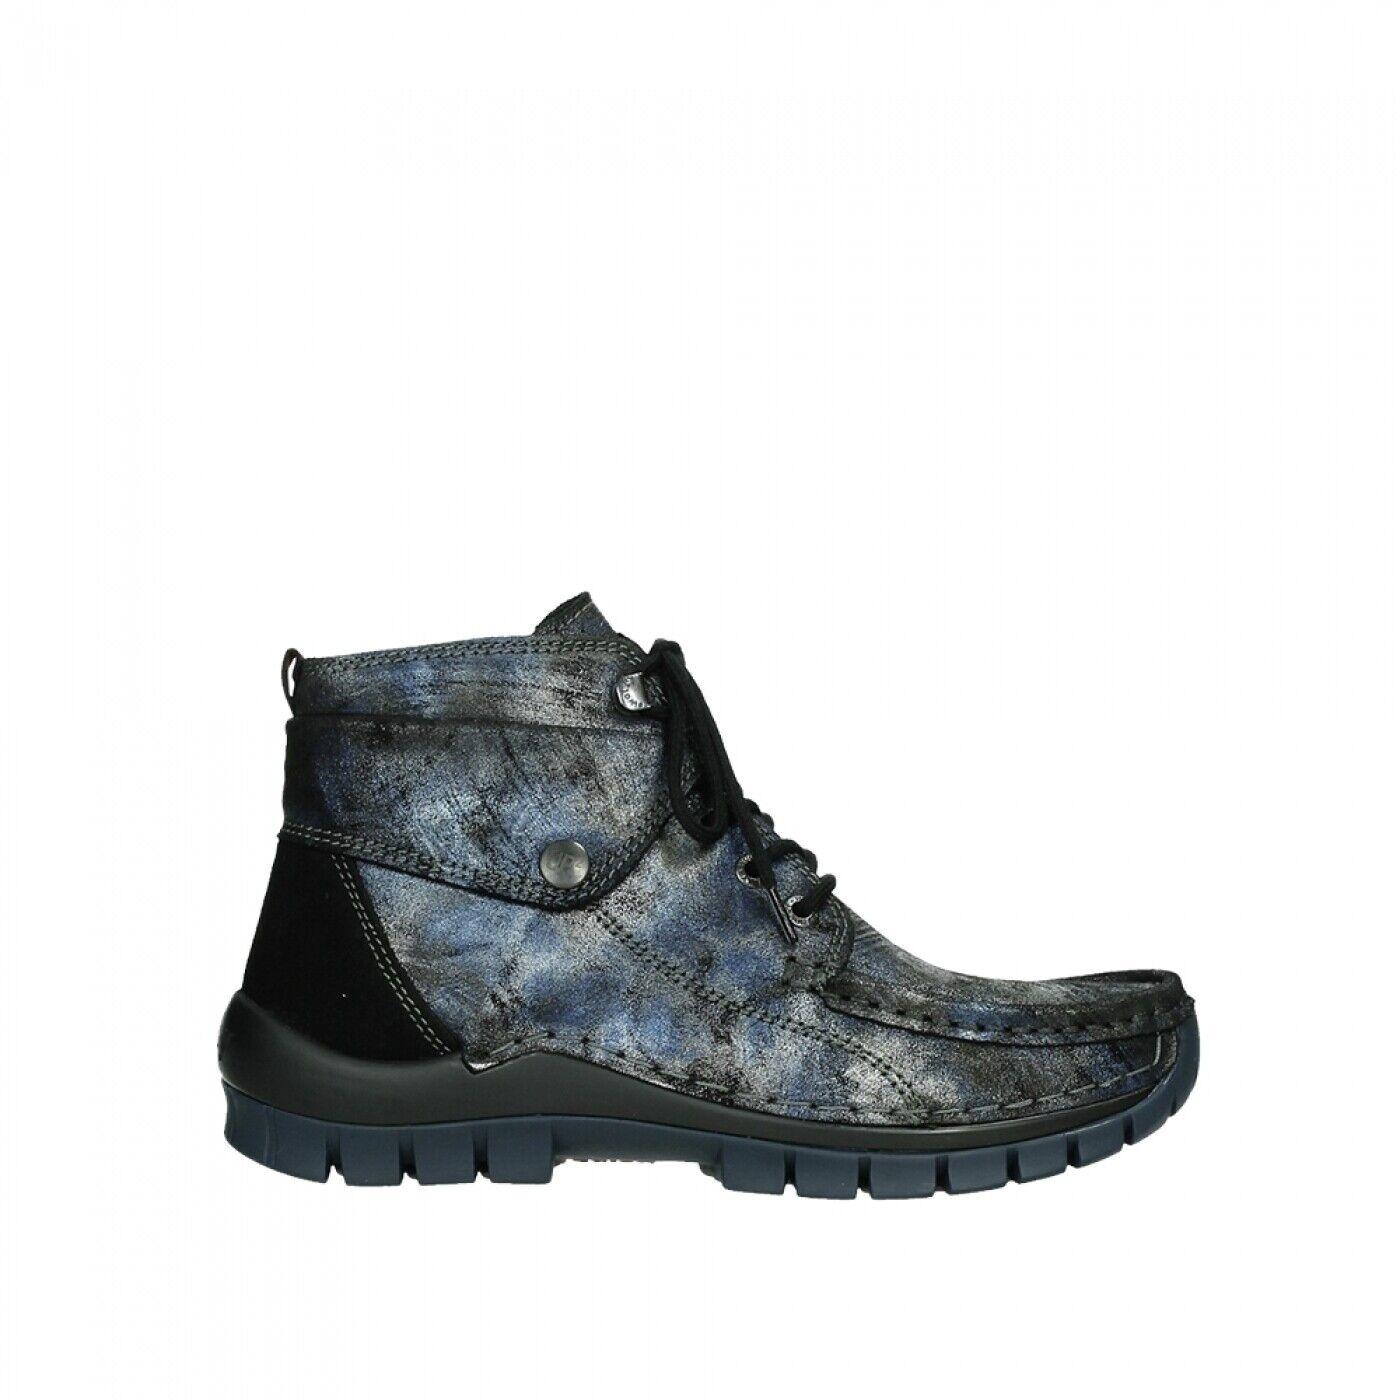 Wolky Stiefel Jump Winter CW Blau 0473646 800